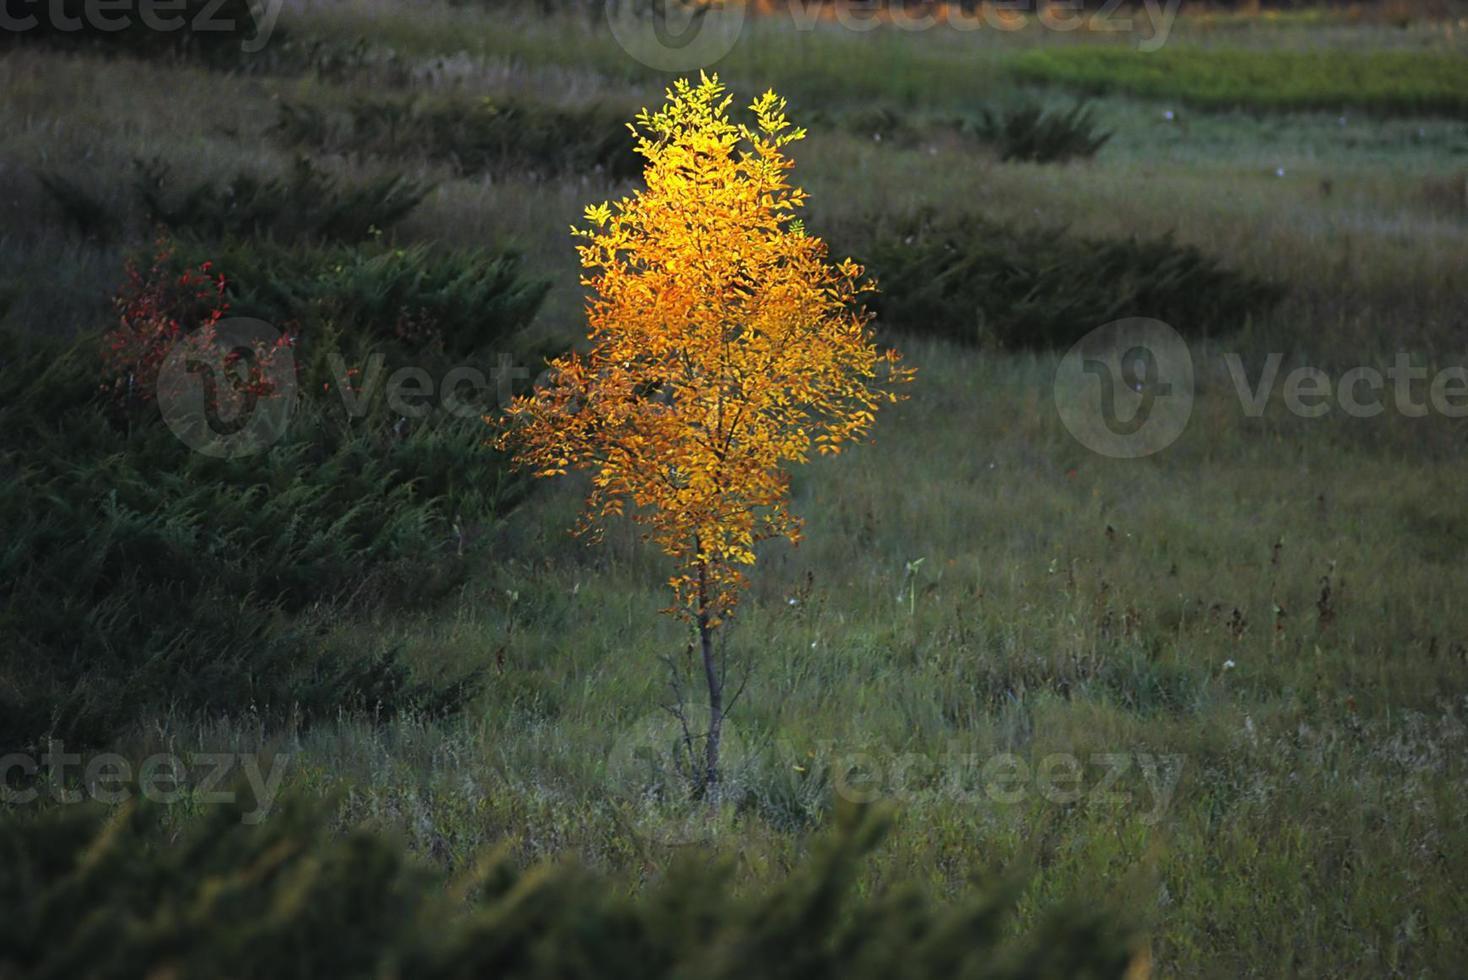 einsamer Ulmenbaum, sonnendurchflutet foto